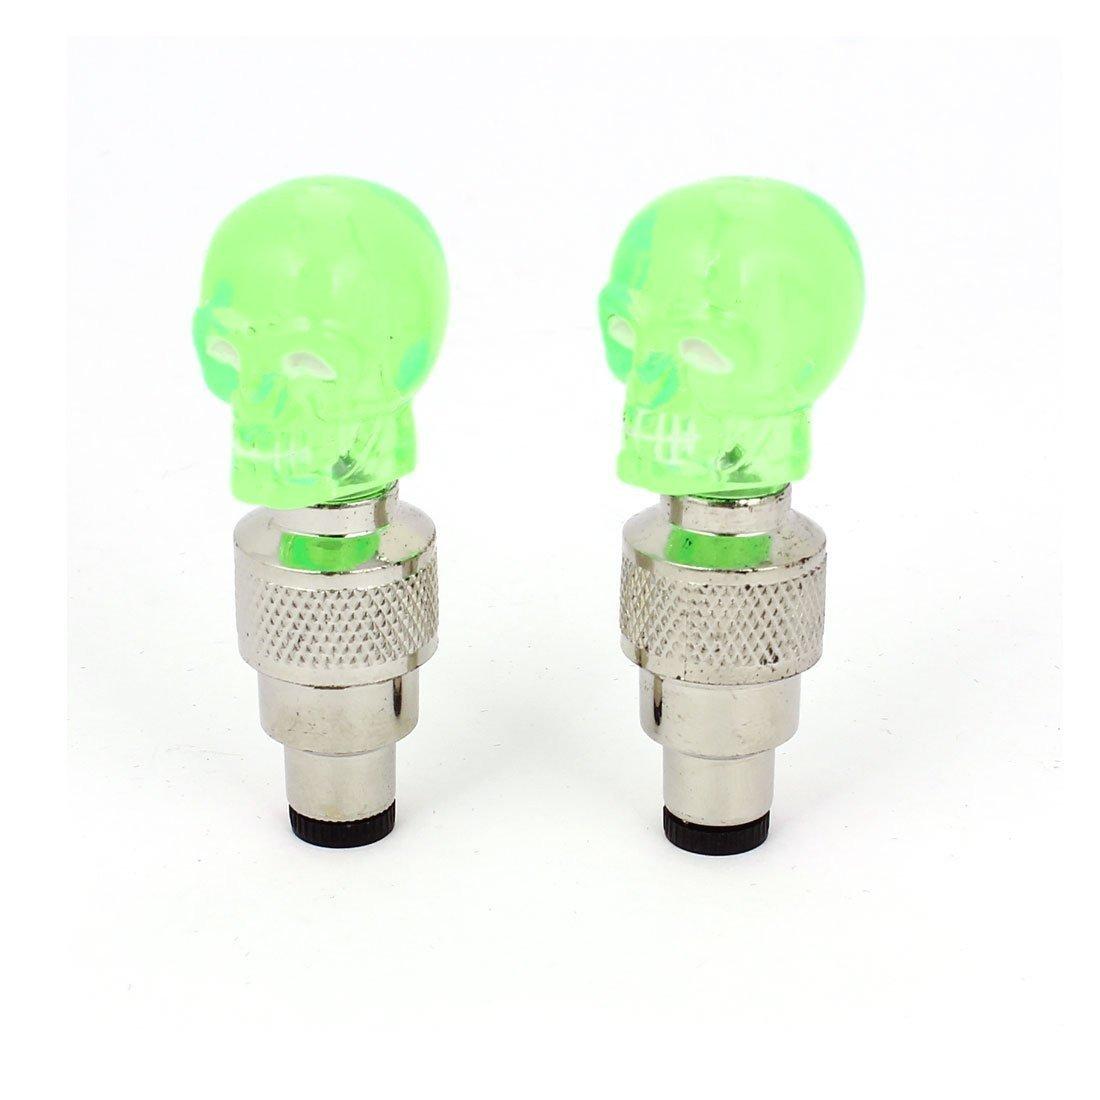 LED Wheel Light Green Head (2 Pcs)